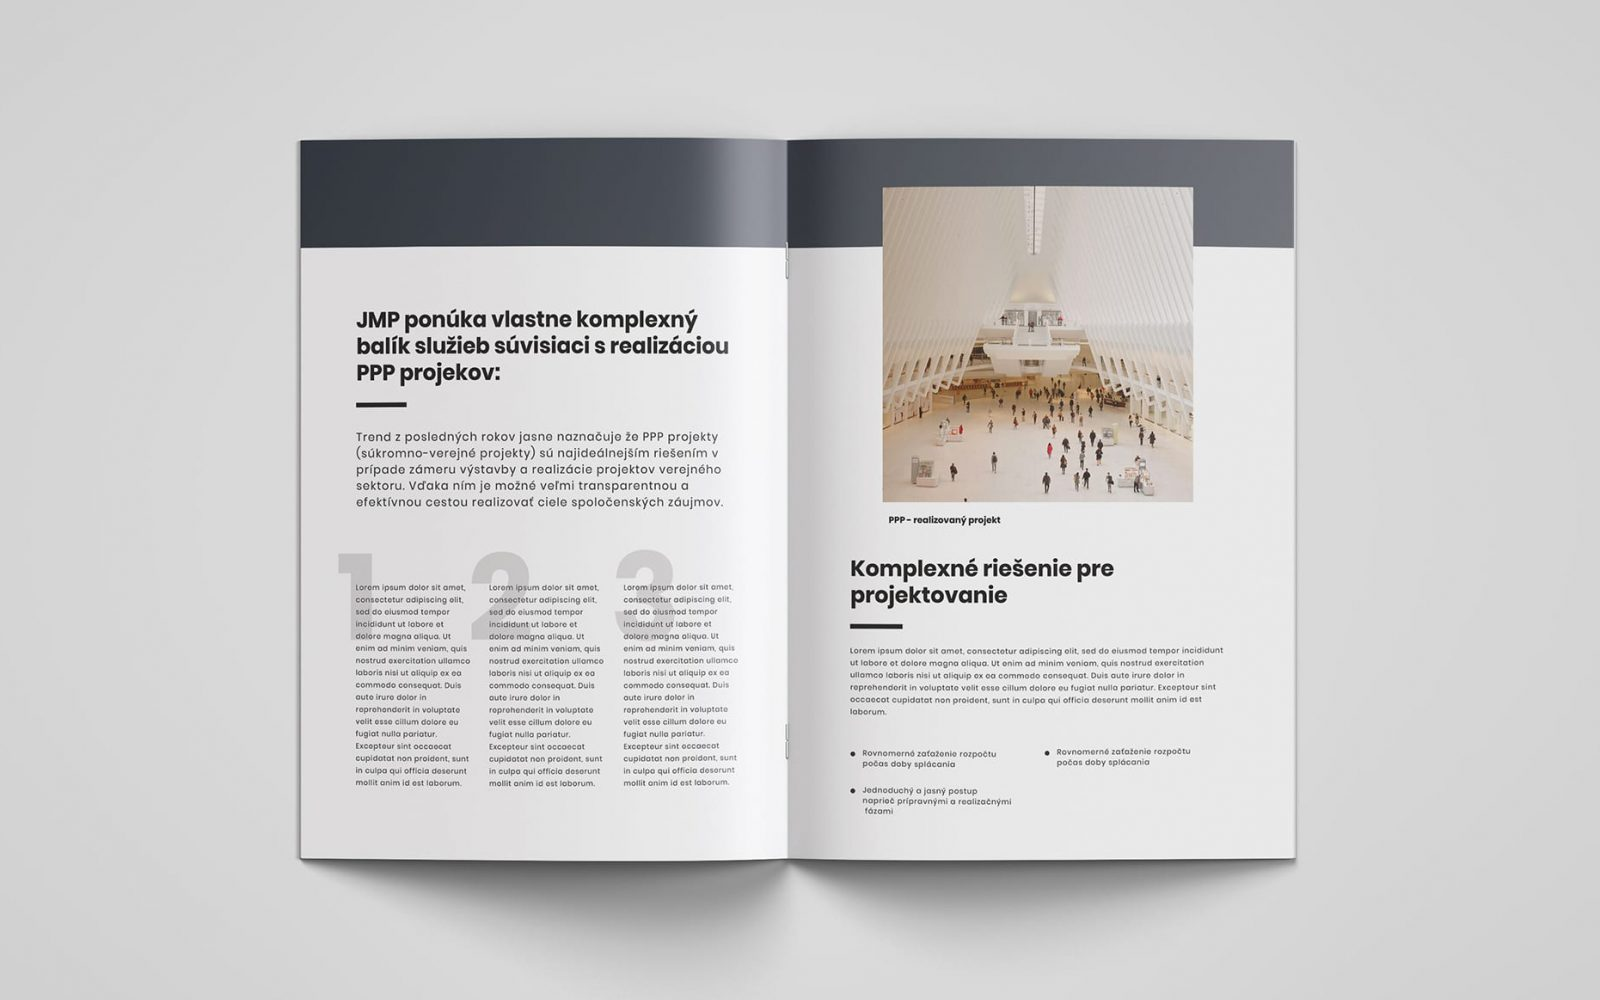 jmp-katalog-2